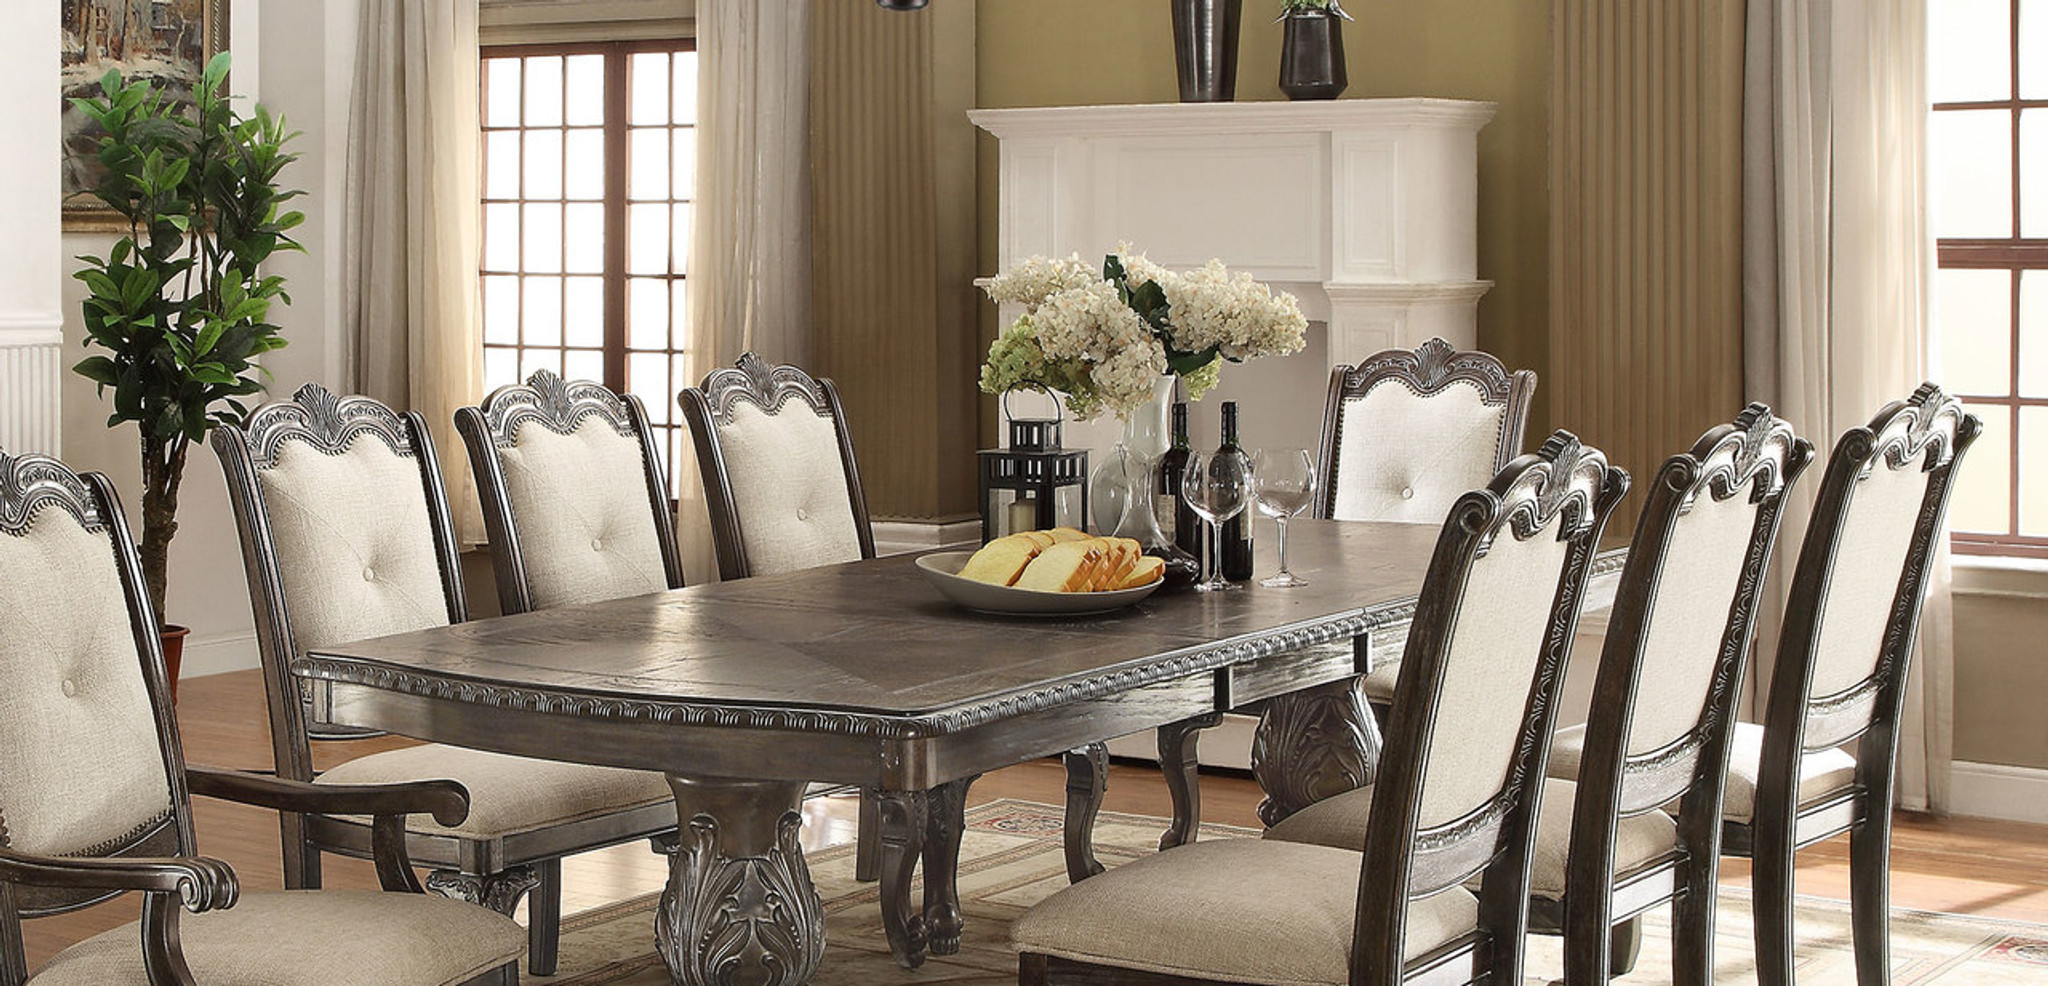 Brilliant Kiera Dining Table Grey Machost Co Dining Chair Design Ideas Machostcouk